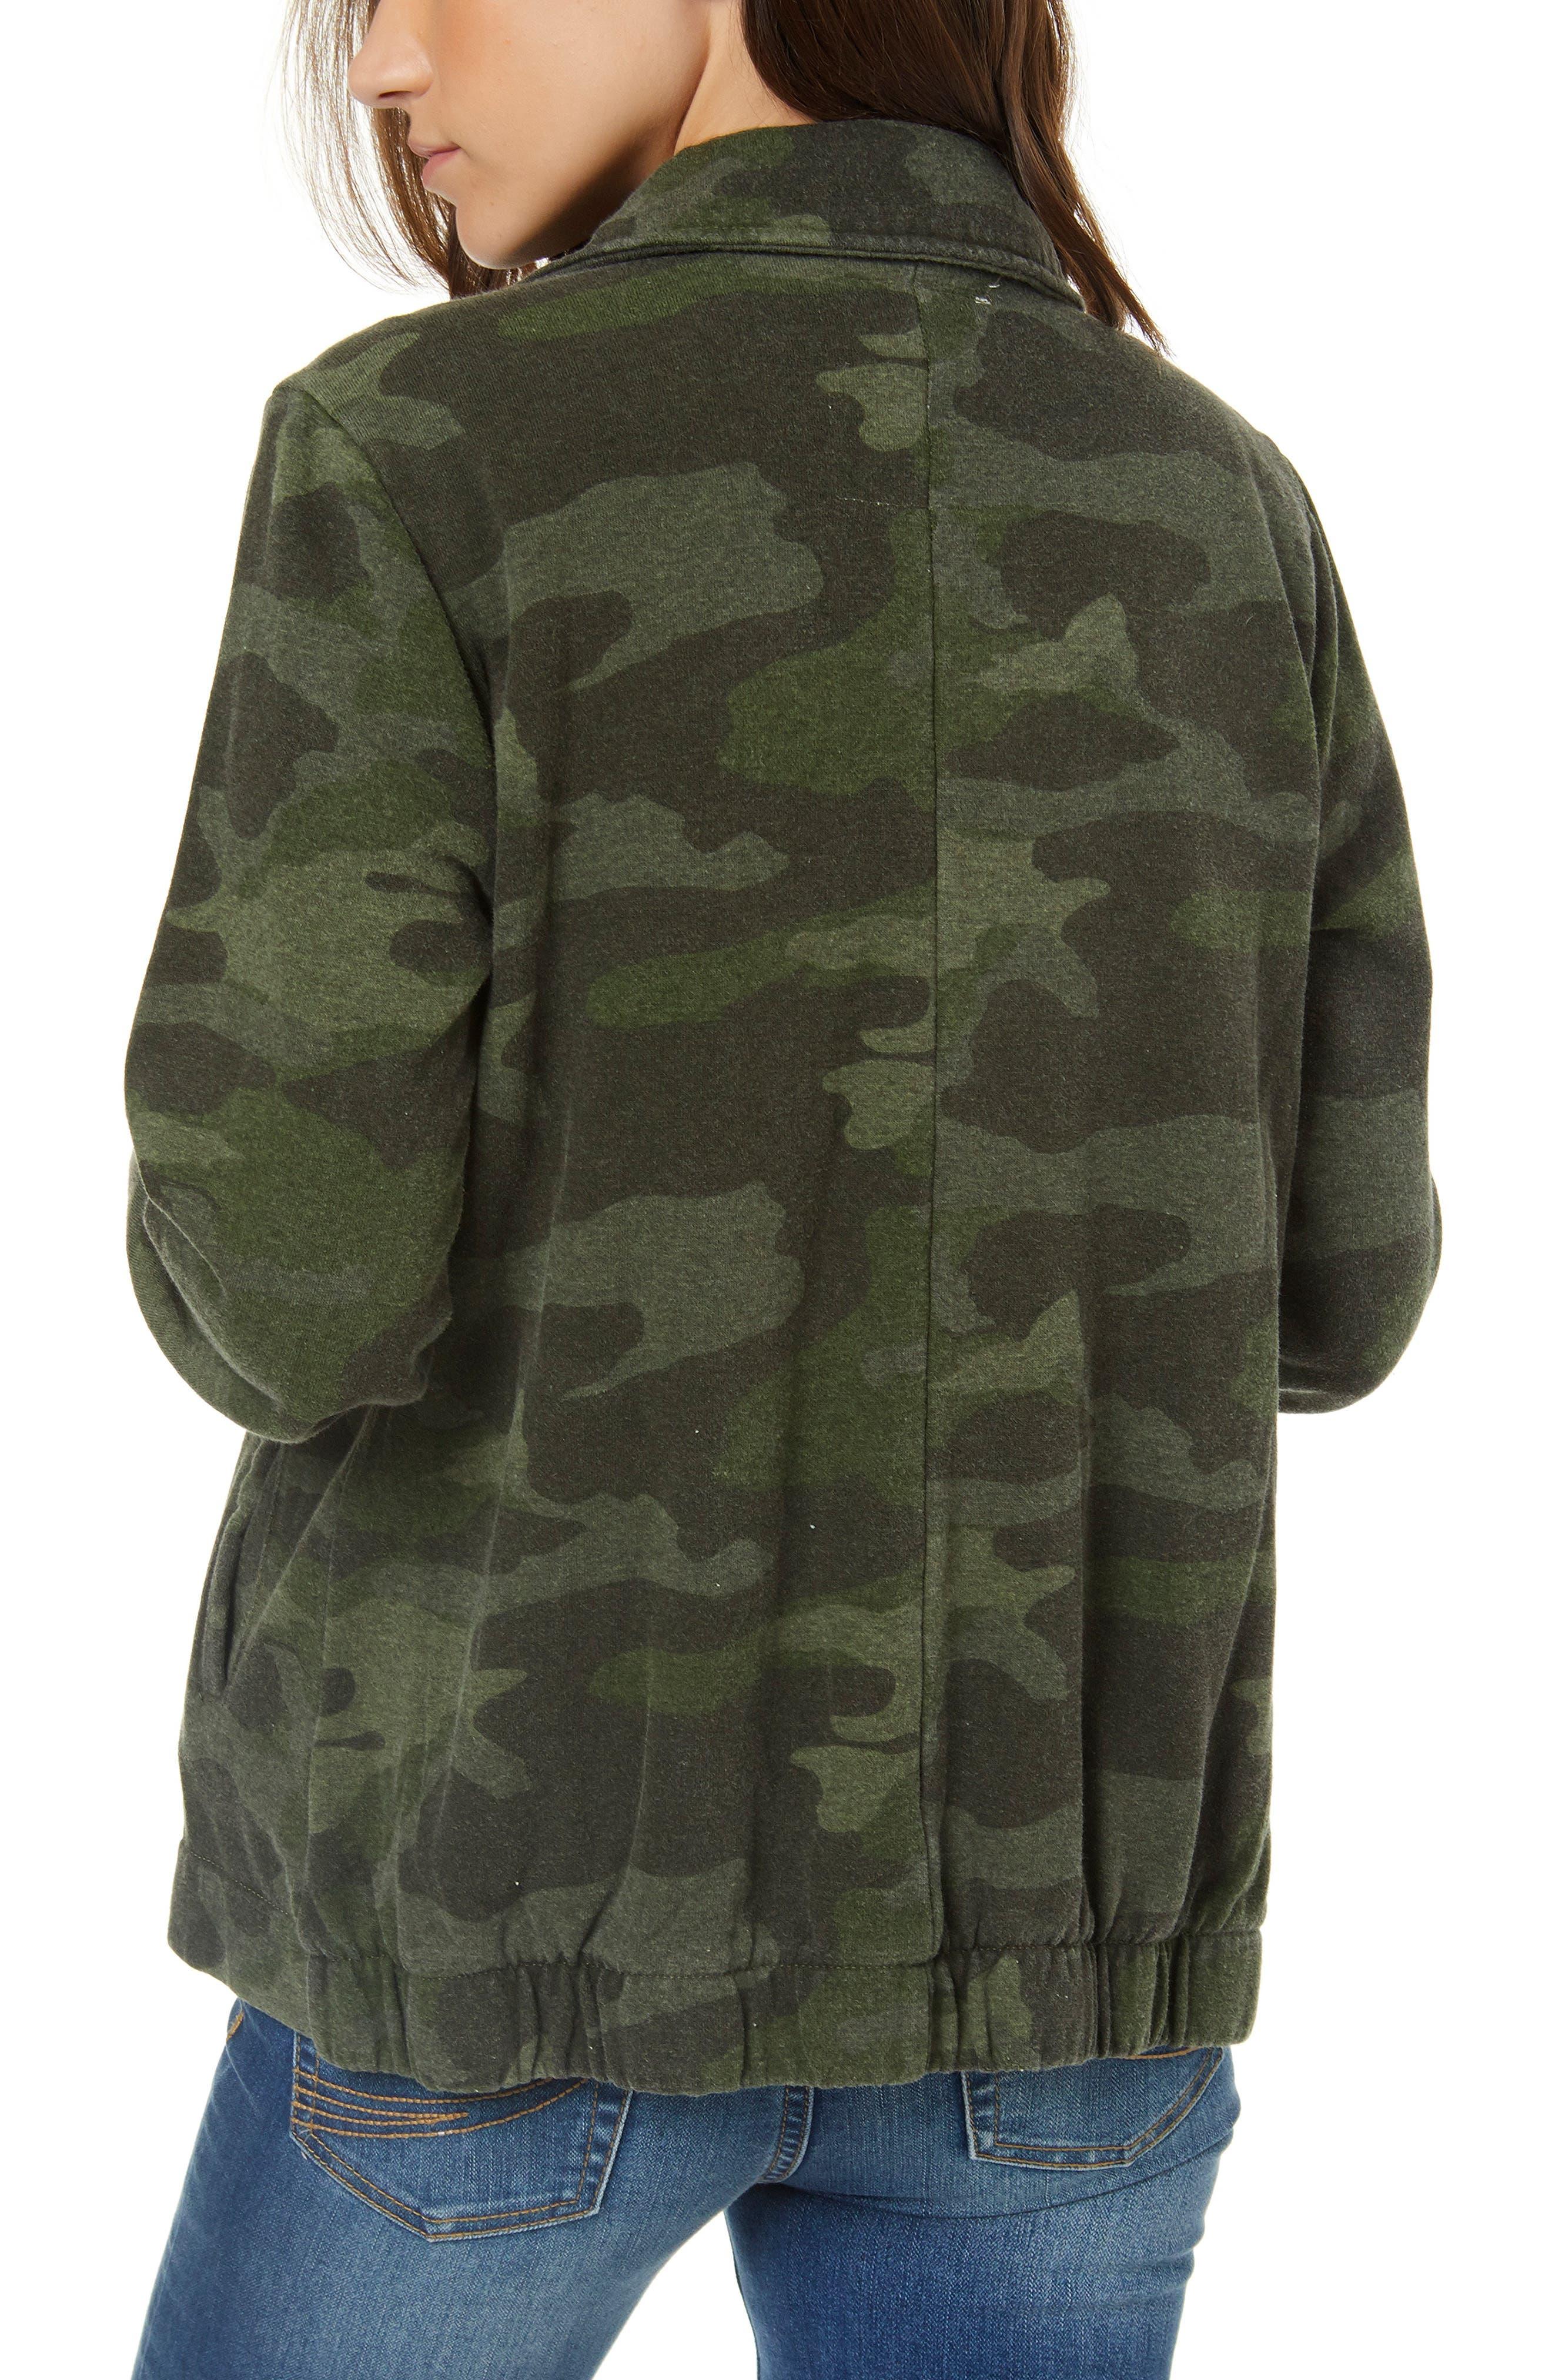 Skylar Camo Fleece Jacket,                             Alternate thumbnail 2, color,                             310